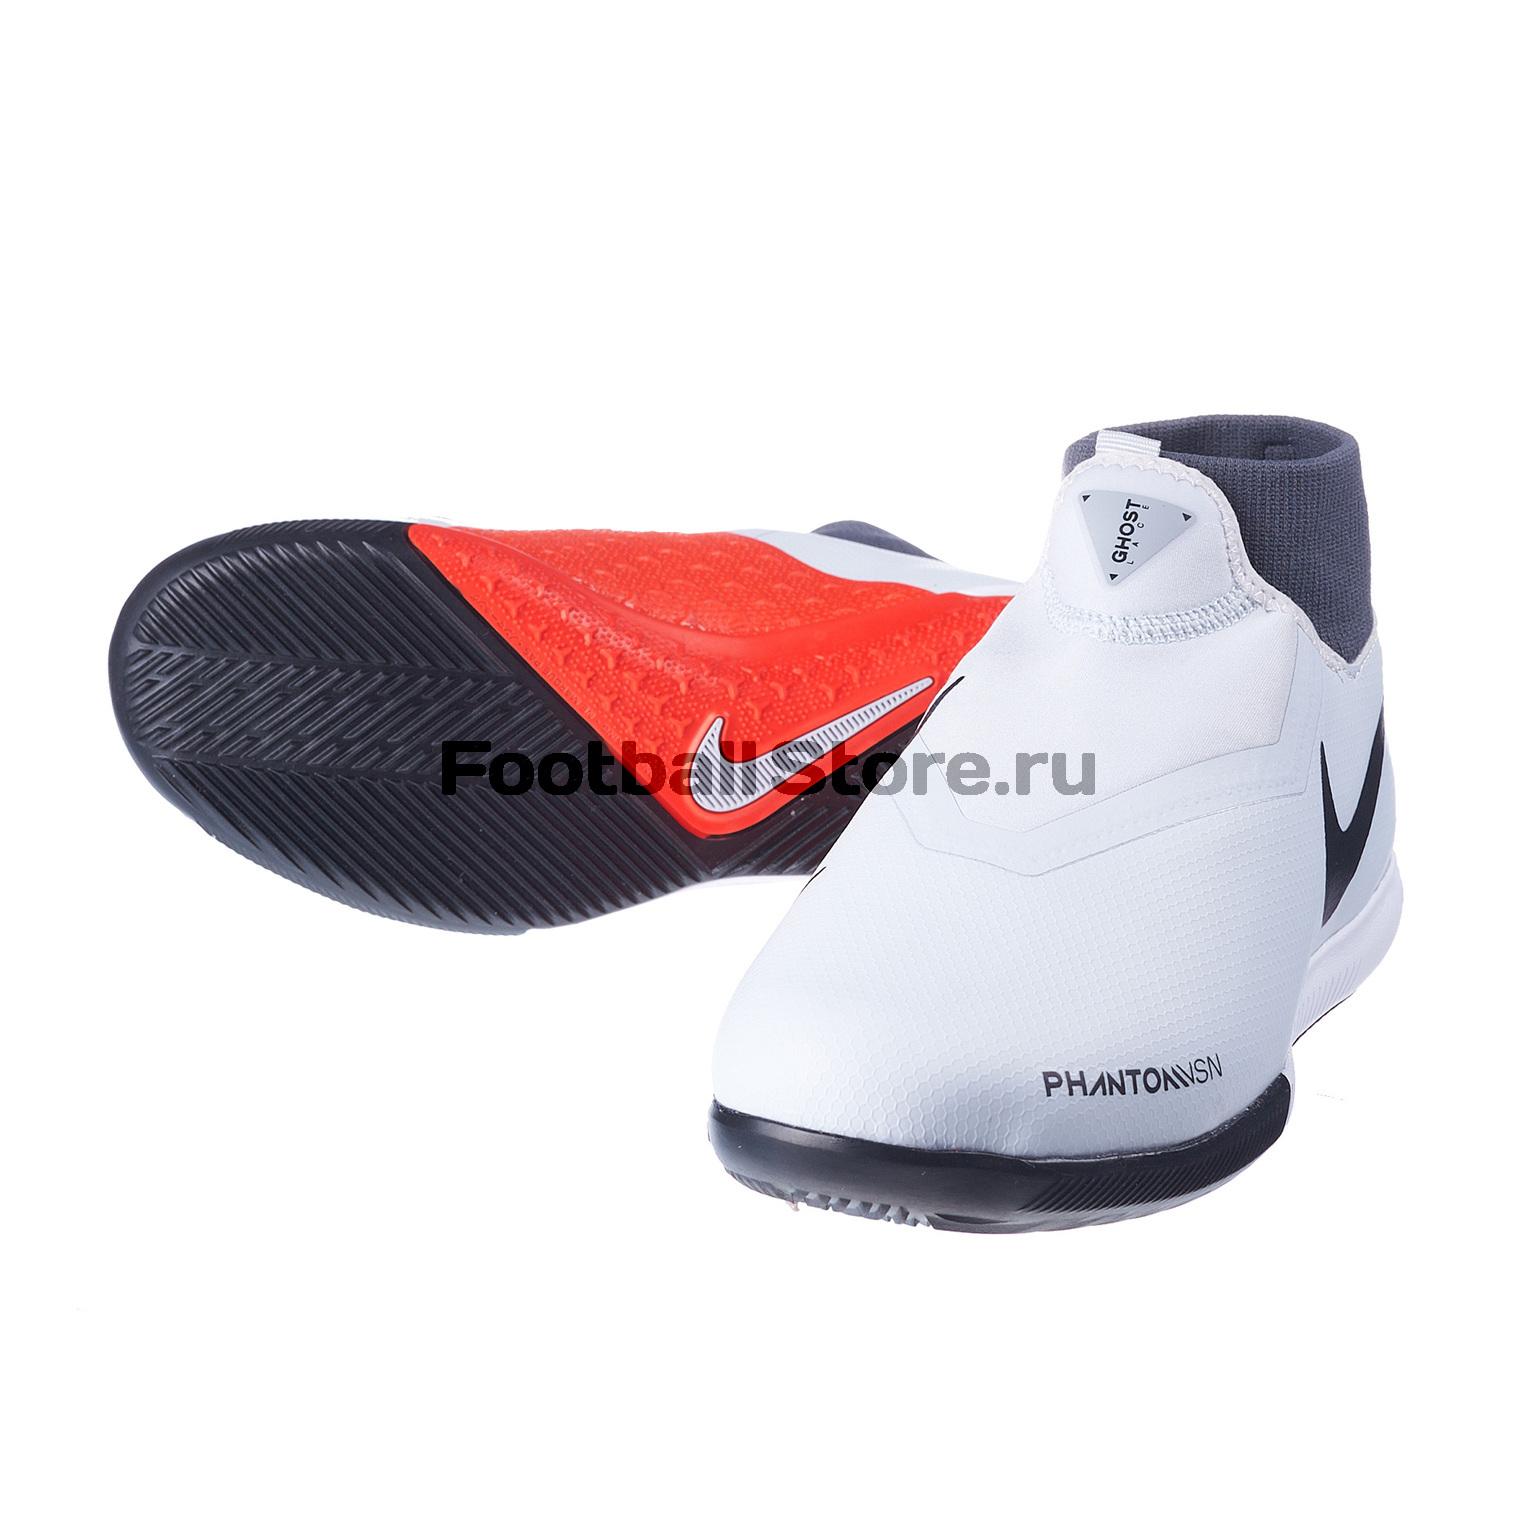 Футзалки детские Nike Phantom Vision Academy DF IC AO3290-060 цена